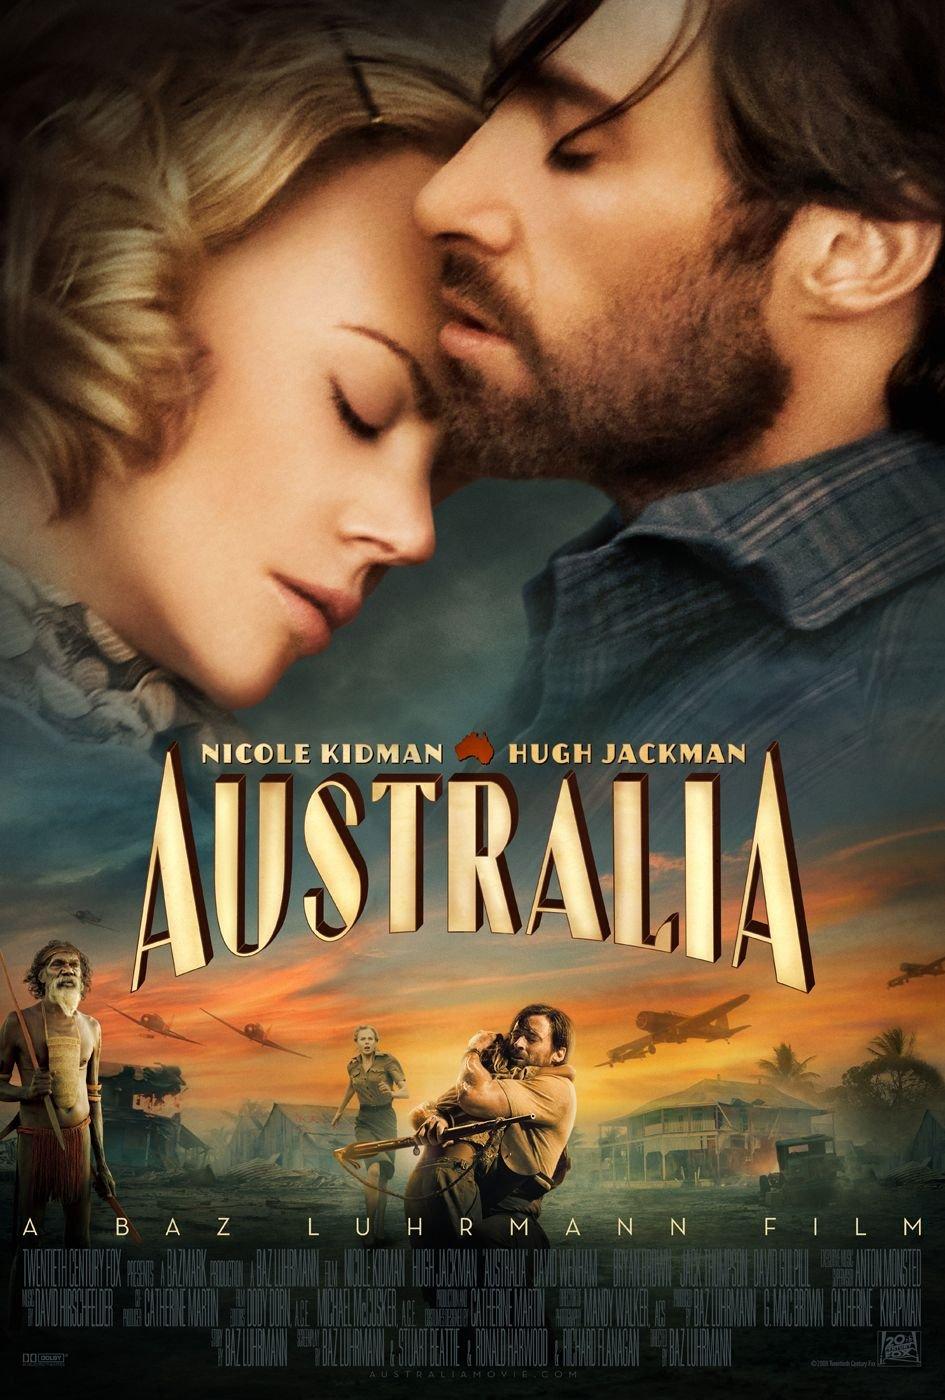 'Australia': A movie to remember